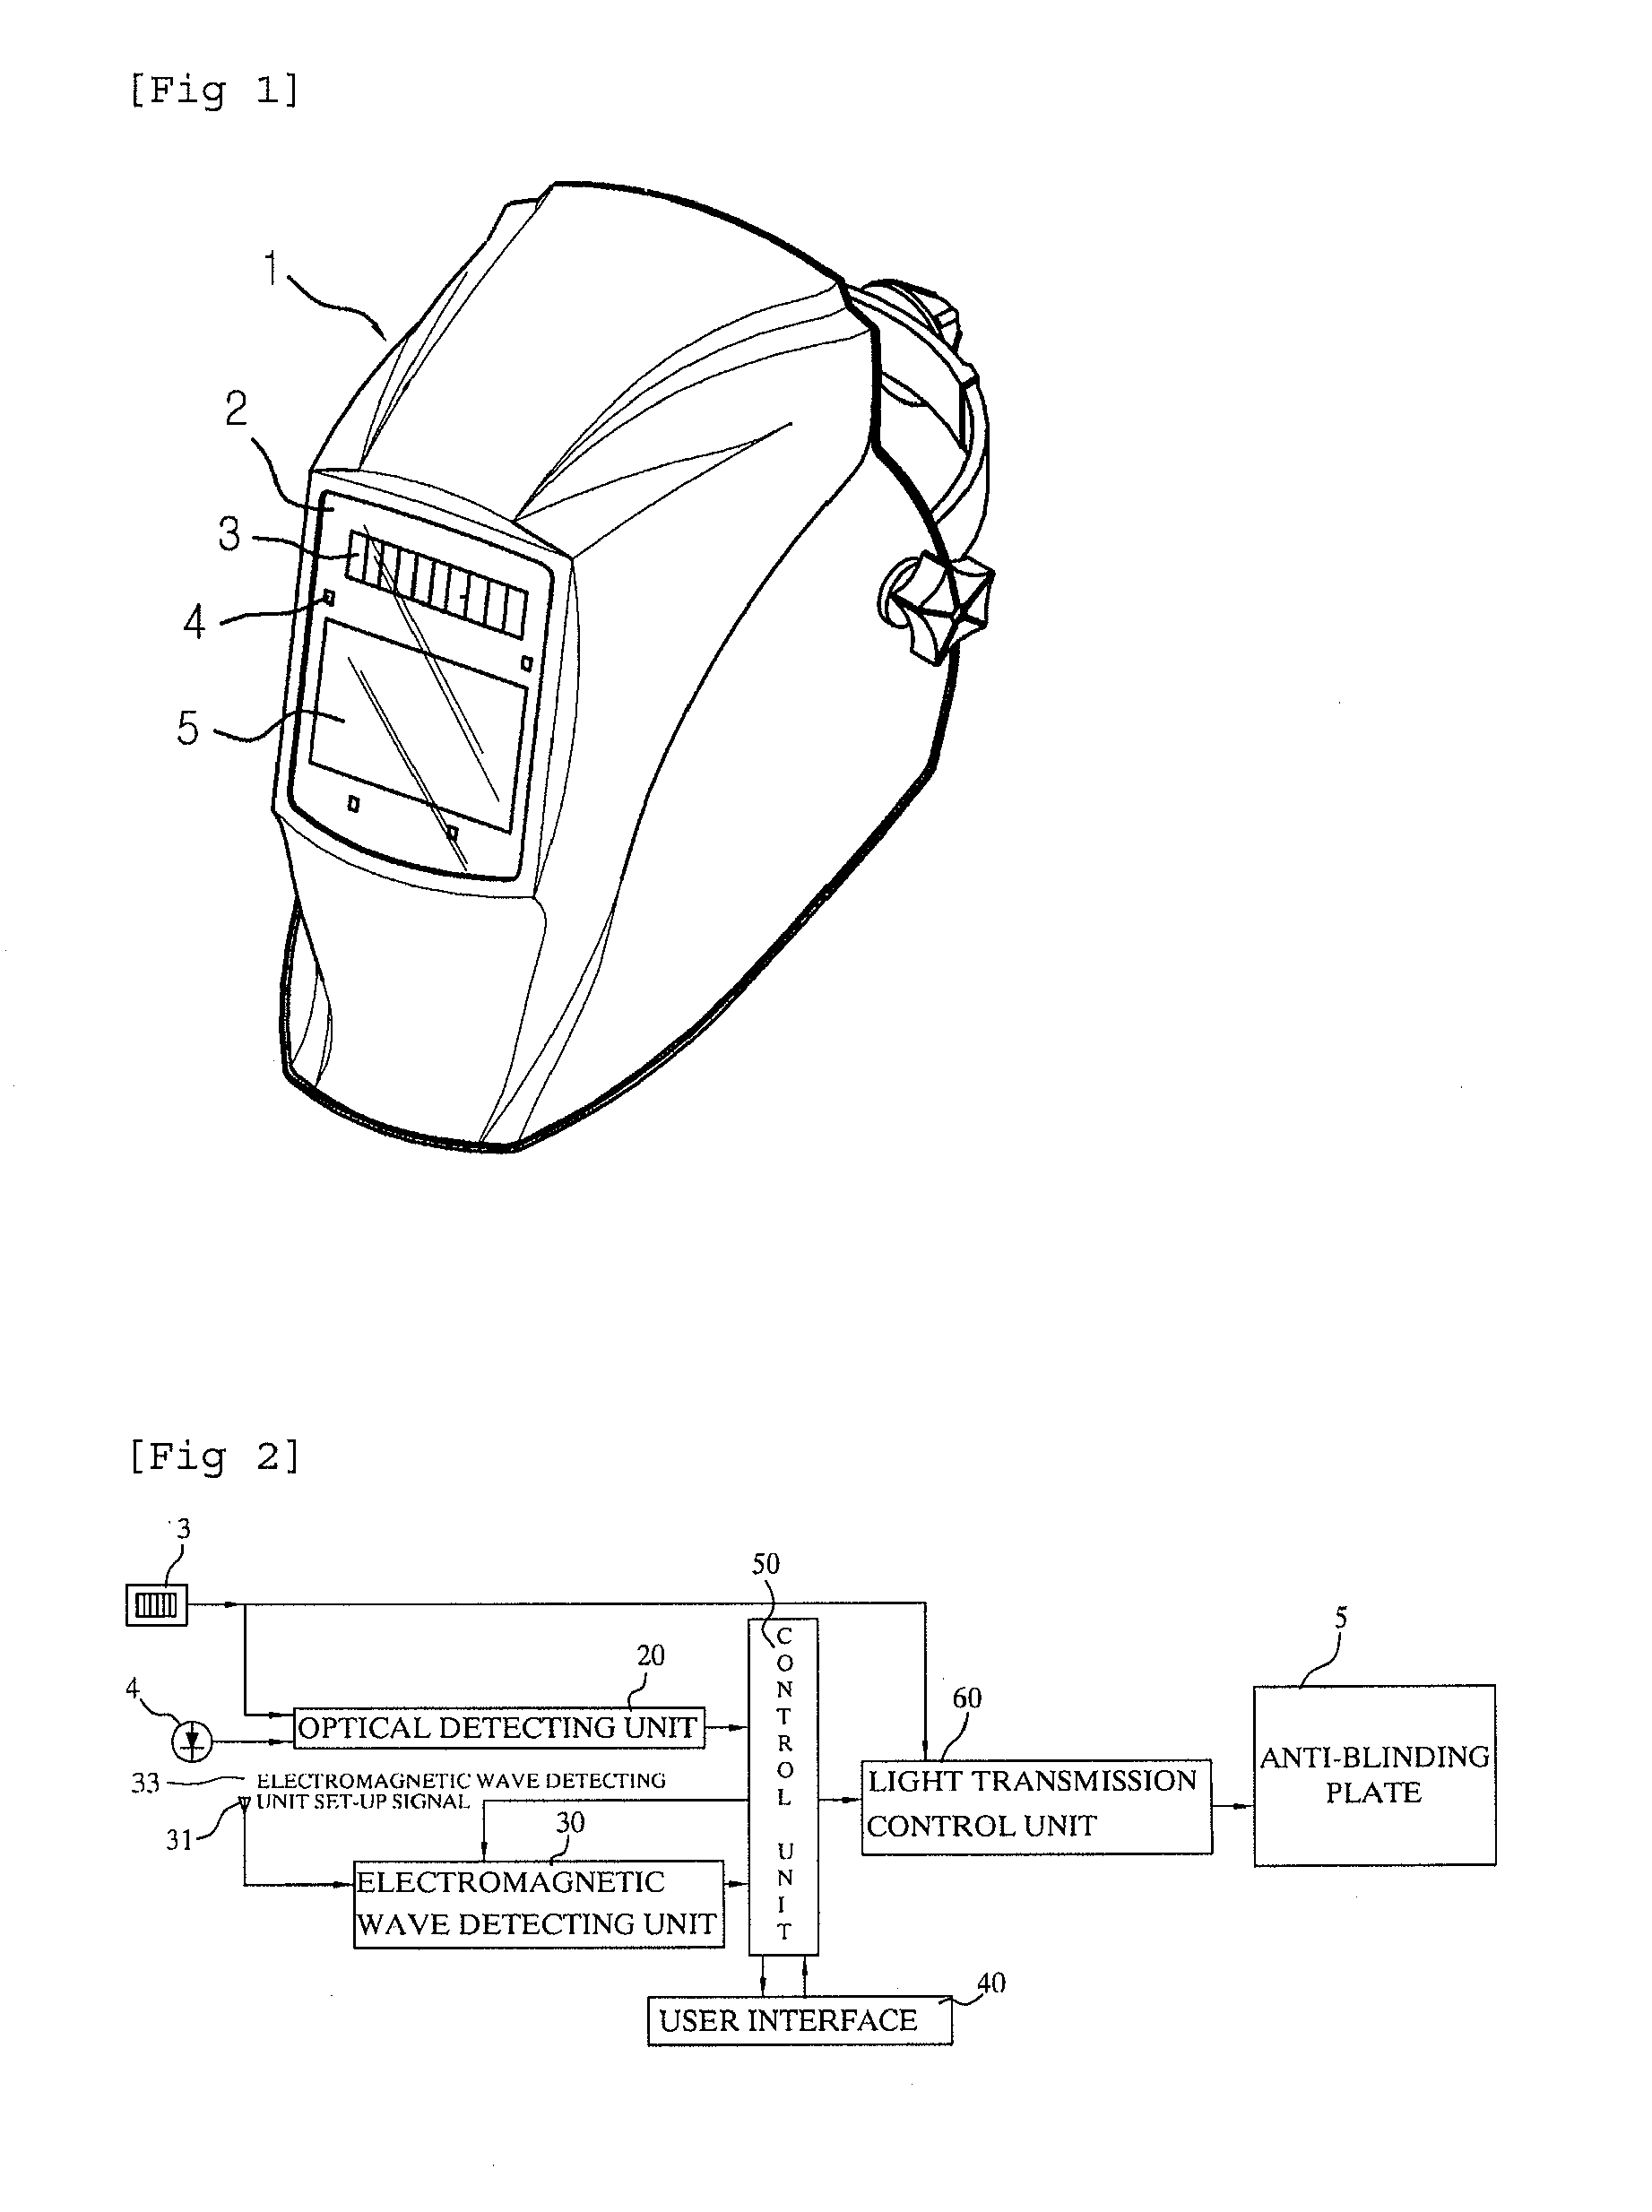 patent epa  welding helmet including antiblinding device, wiring diagram